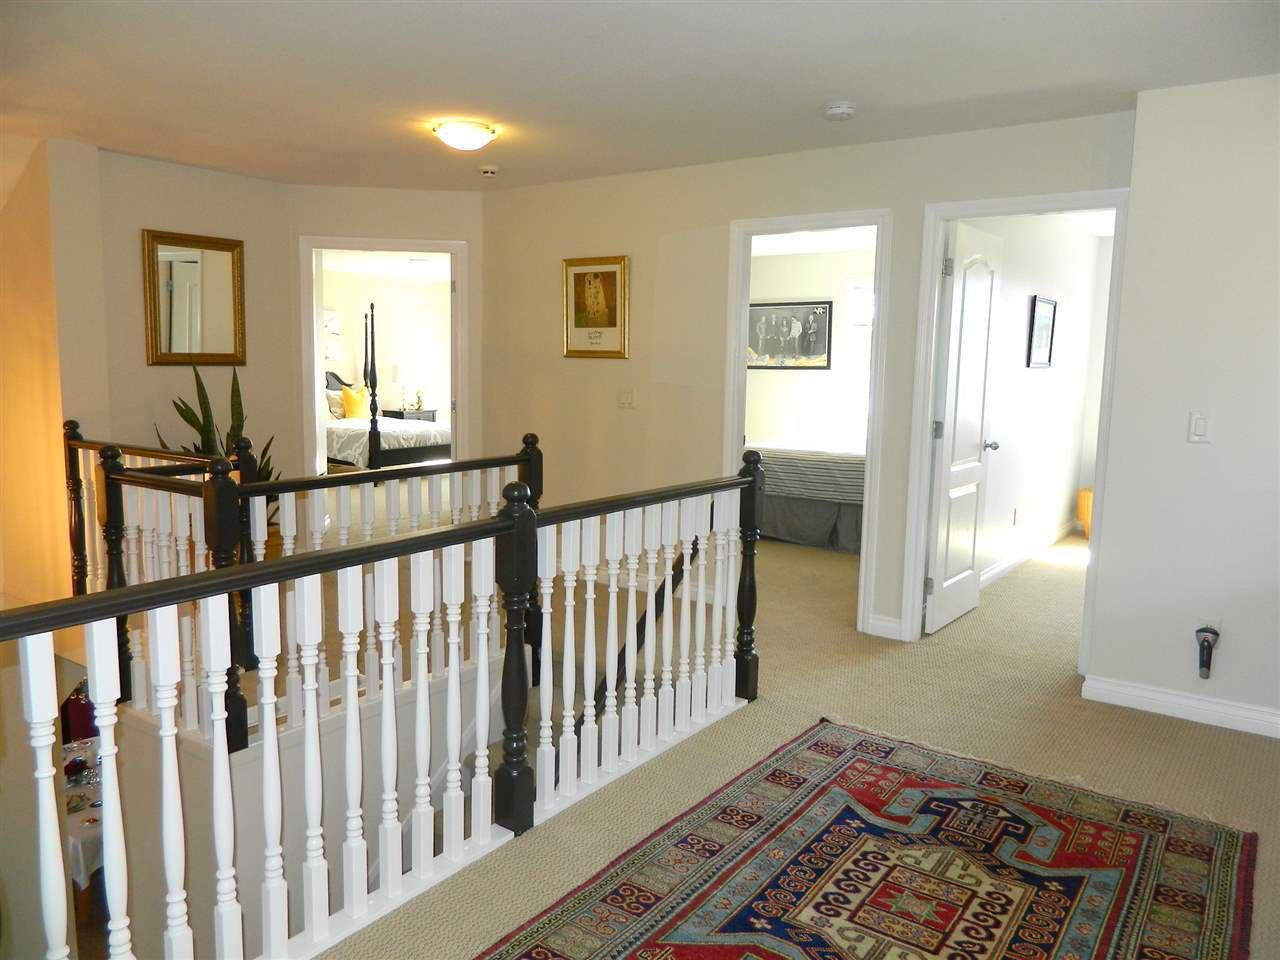 Photo 16: Photos: 24332 104 AVENUE in Maple Ridge: Albion House for sale : MLS®# R2051414